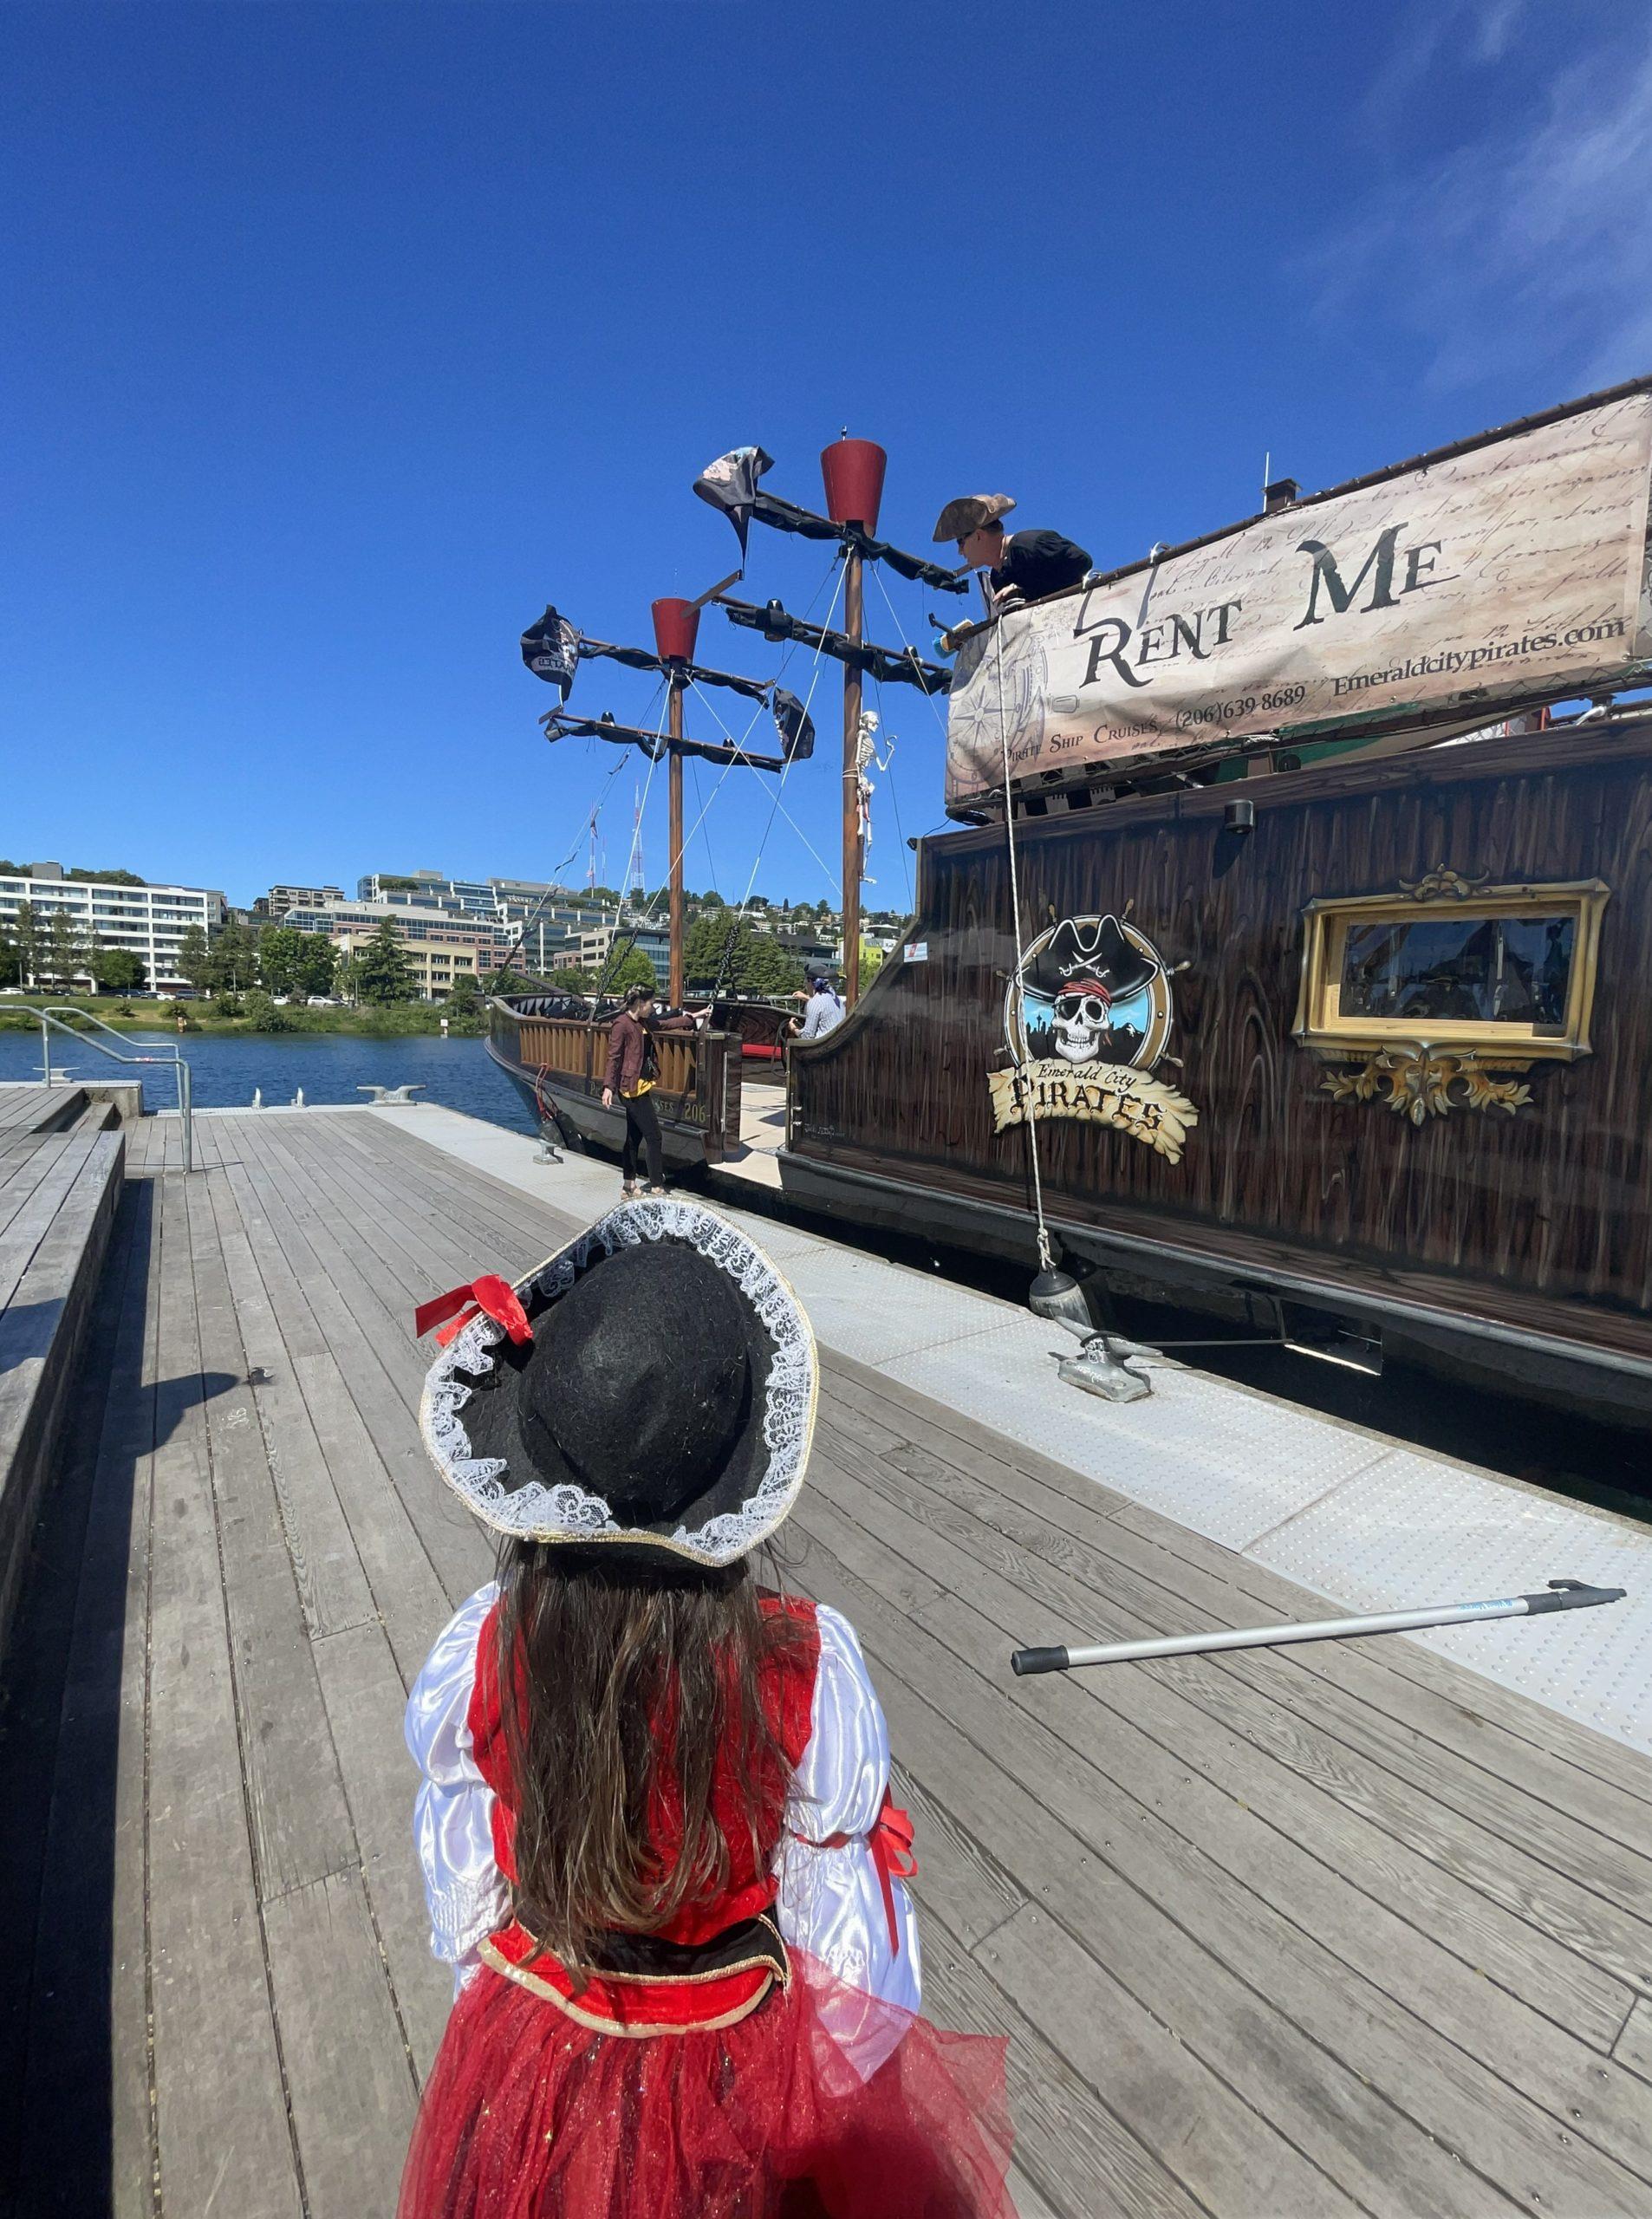 Seattle treasure cruise